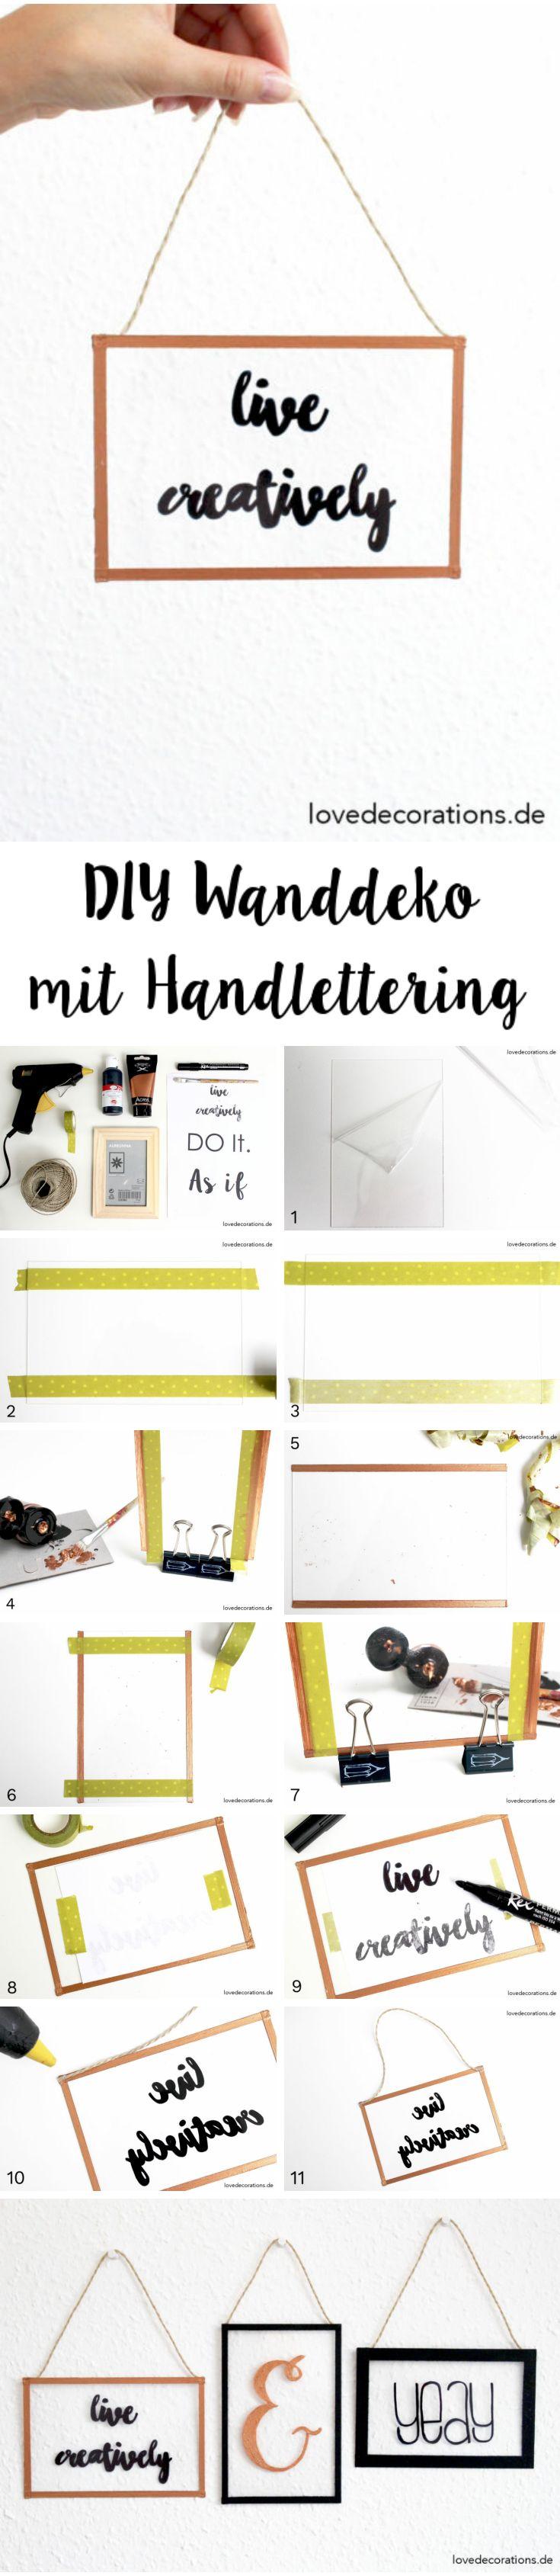 DIY Wanddeko mit Handlettering selbermachen